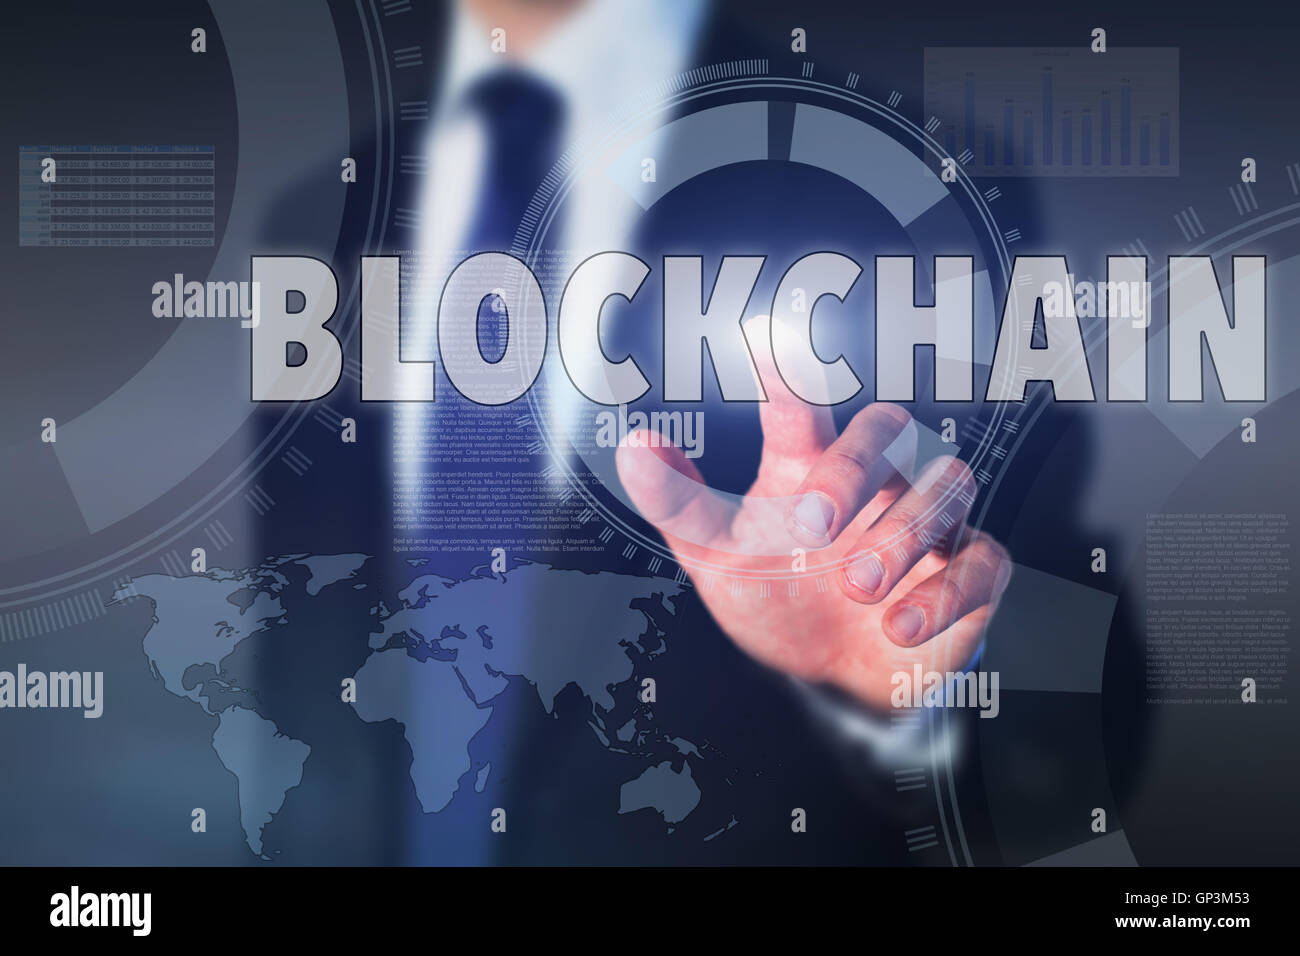 blockchain concept, business man pressing button on high tech screen - Stock Image